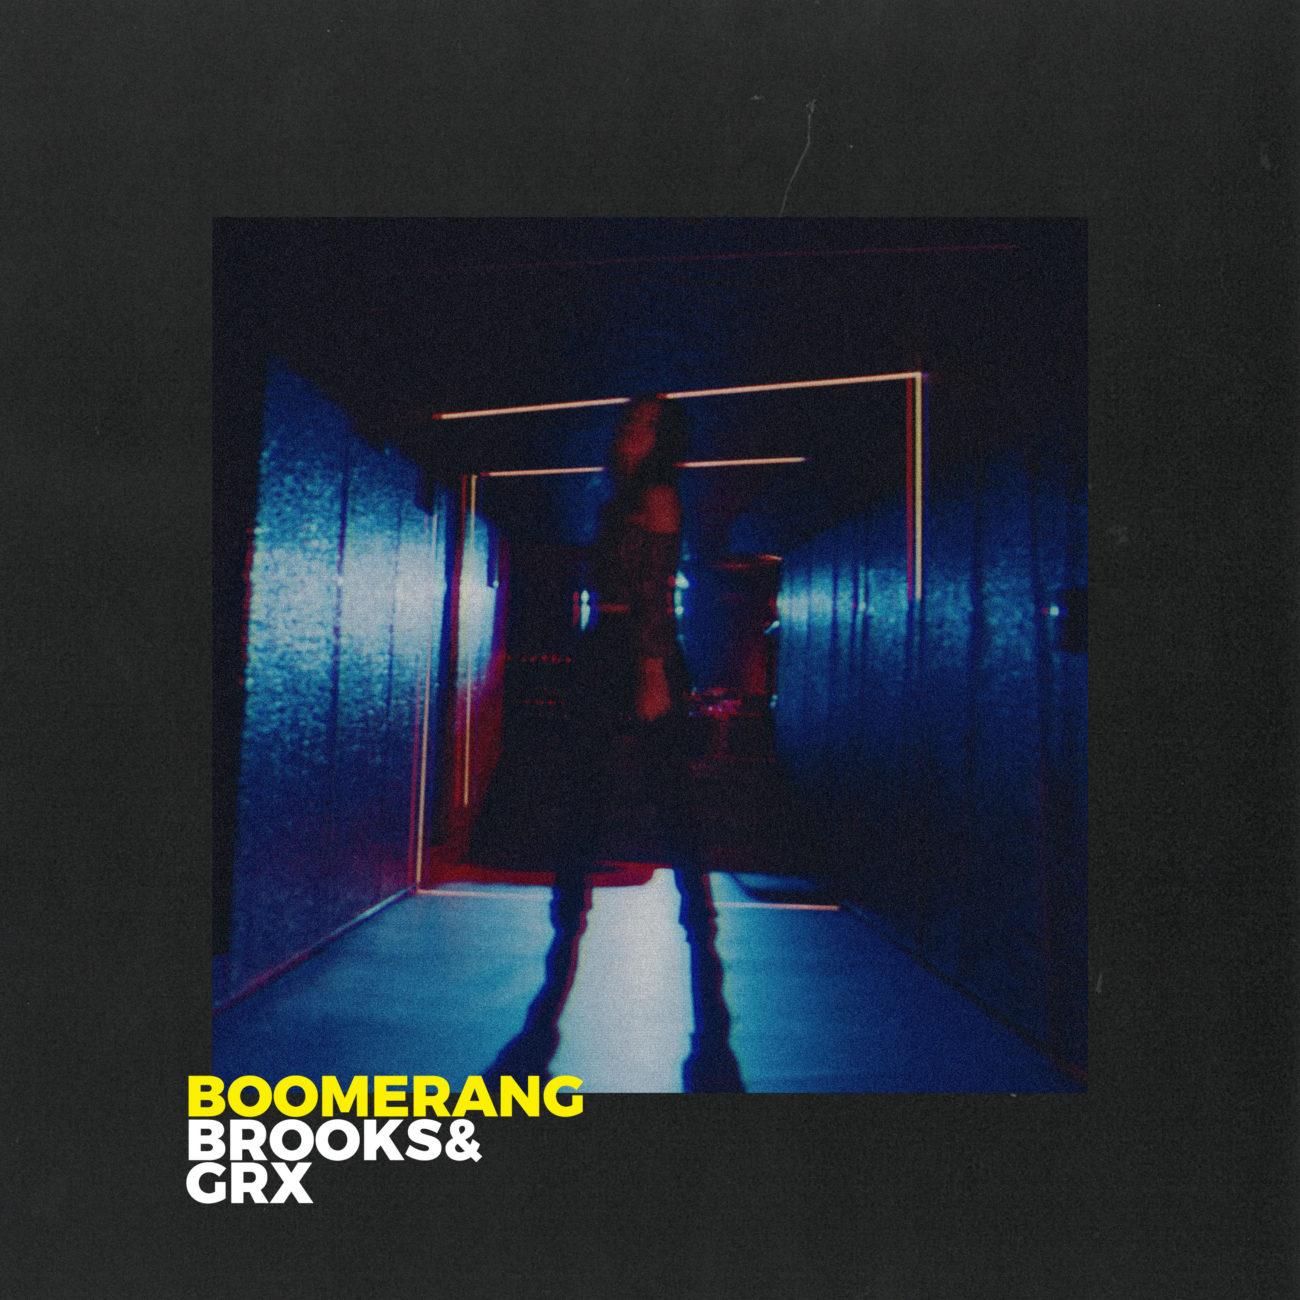 Brooks_boomerang